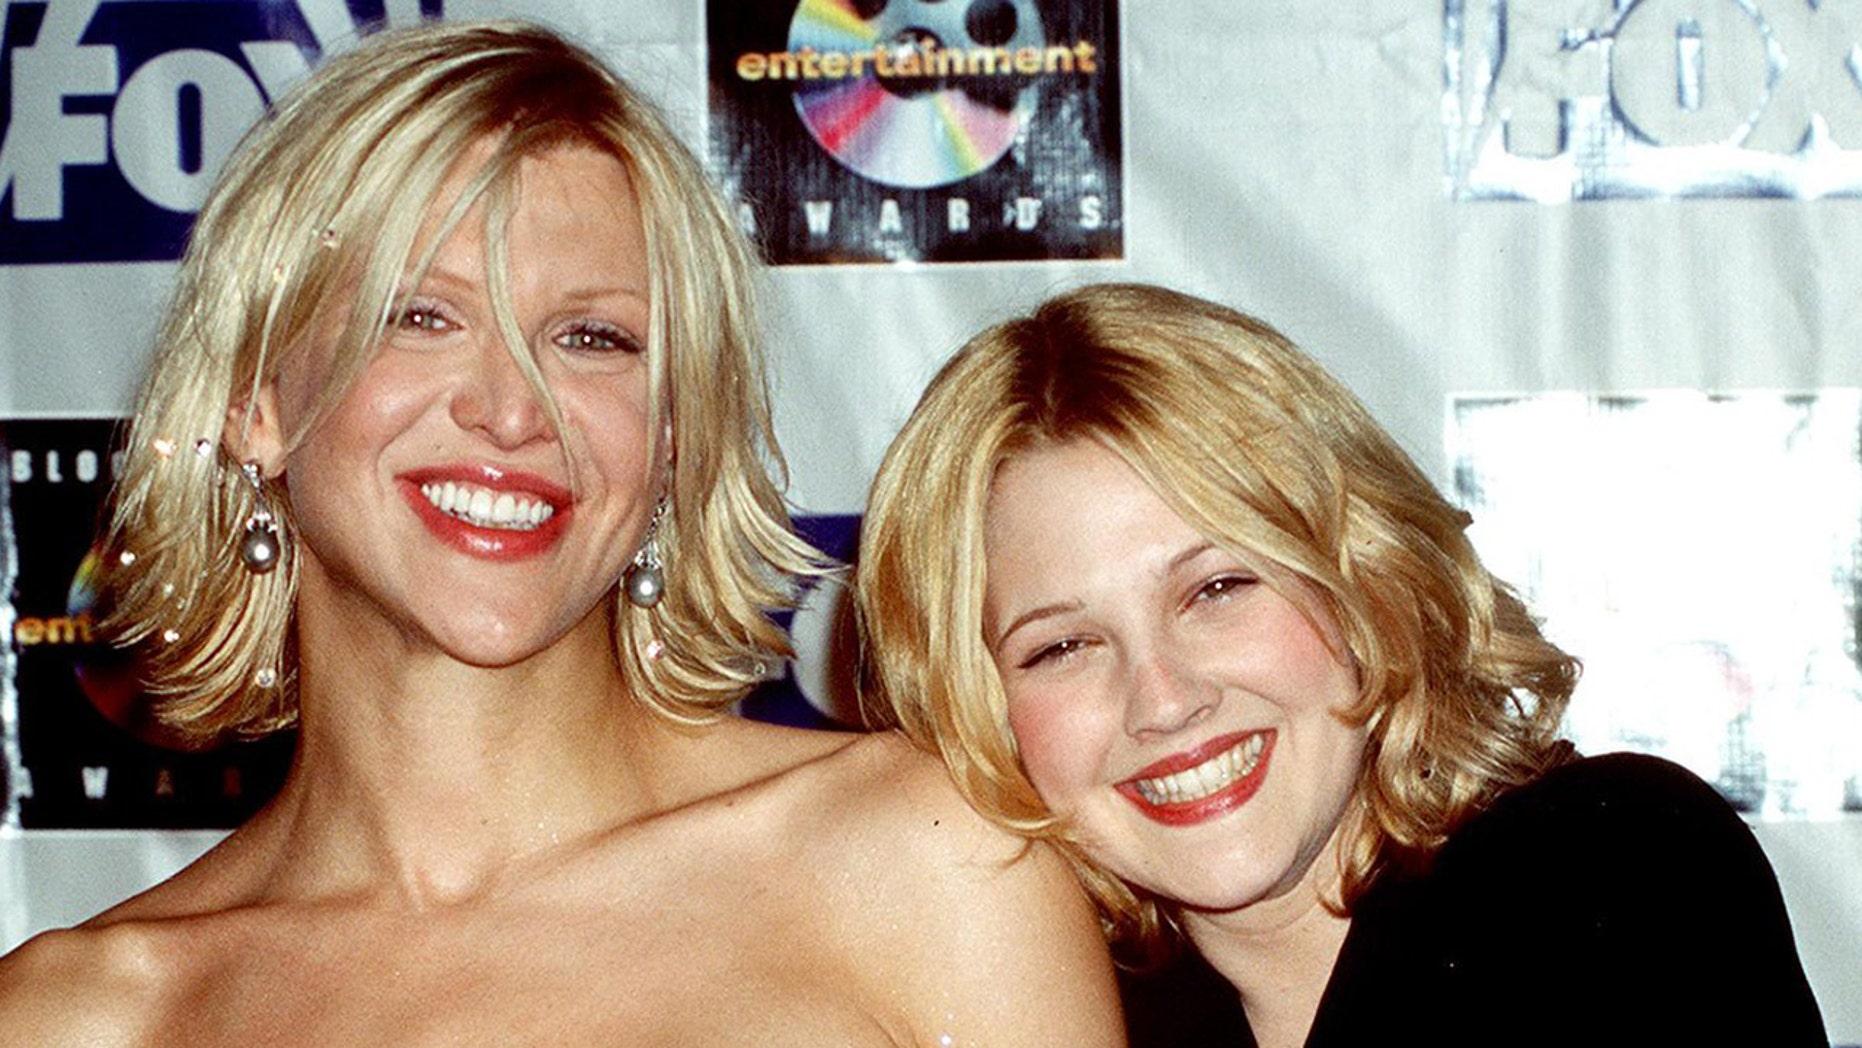 Drew Barrymore recalls one wild night with Courtney Love.